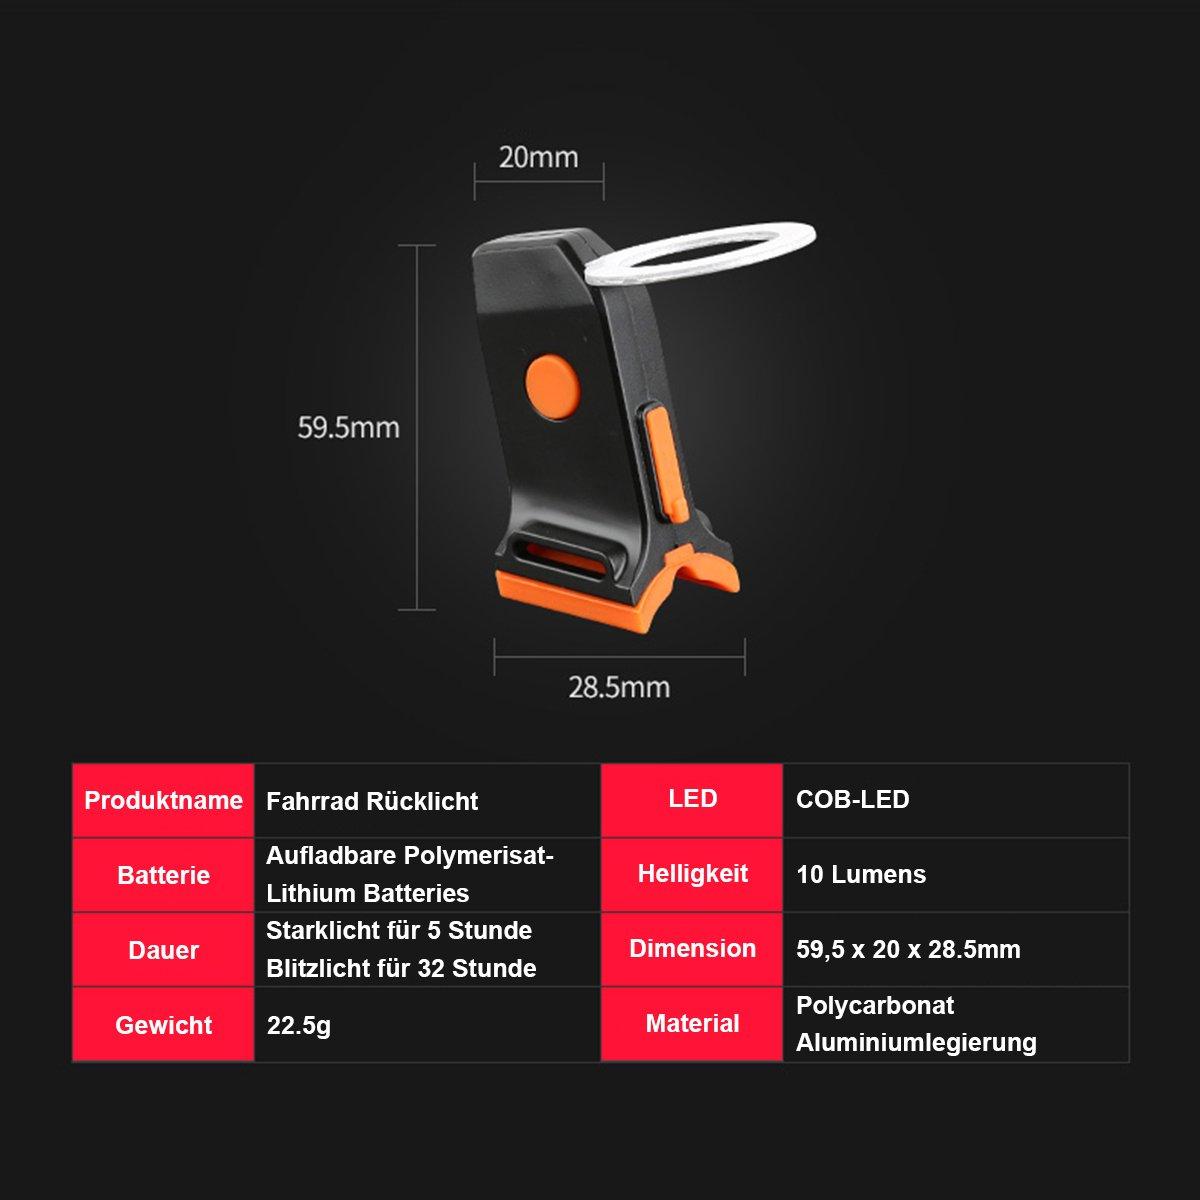 Bicicleta Luz trasera 3/tipos /& # xff08; triangular coraz/ón y C/írculo /& # xff09; liebenswert Mini bicicleta l/ámpara Super claro y USB aufladebar F/ácil Instalaci/ón con 3/Modos de Luz